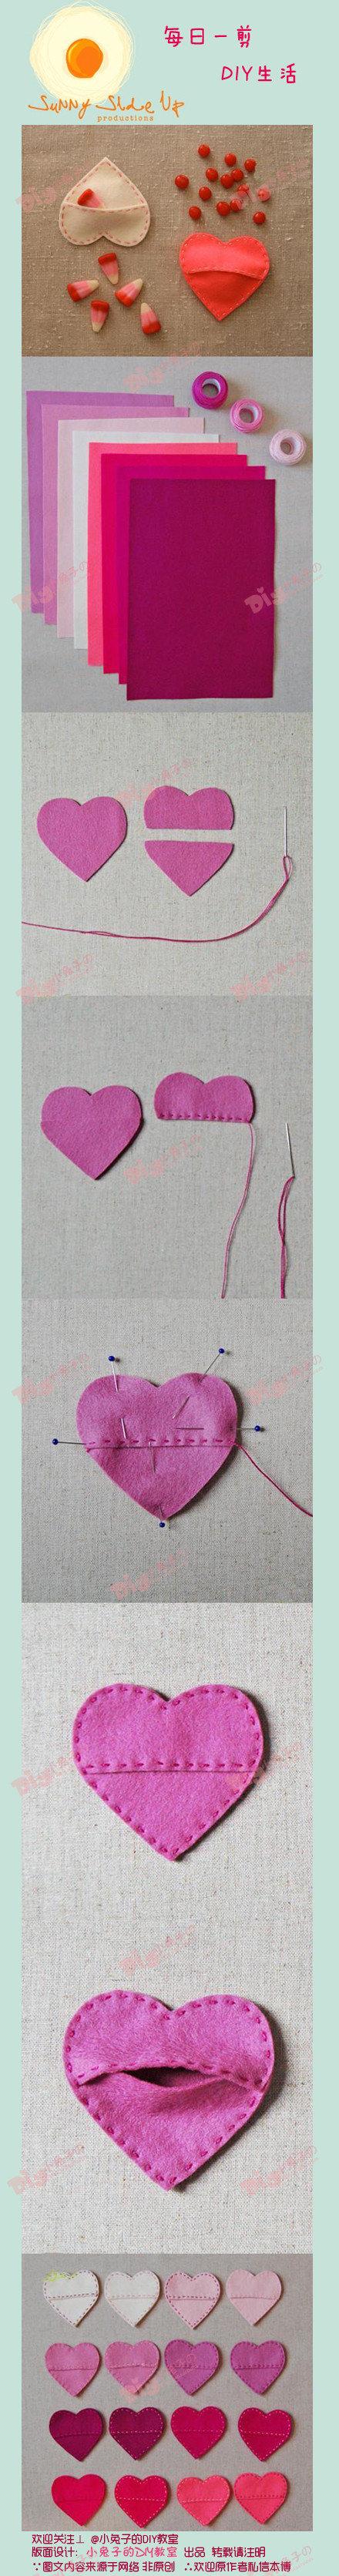 DIY-Little-Heart-Pocket_large.jpg